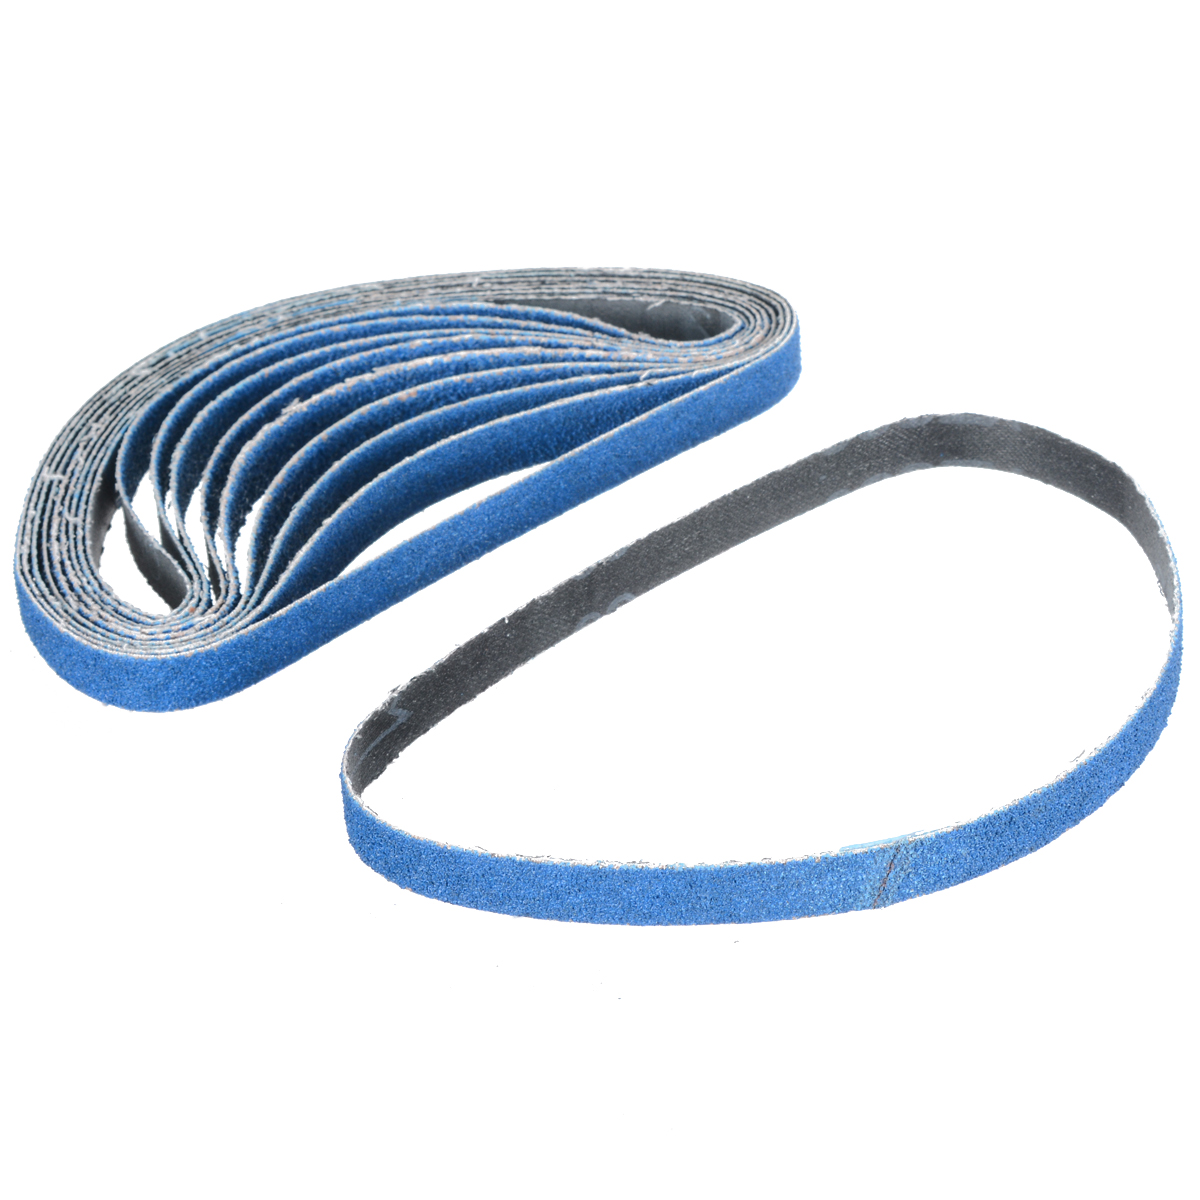 10pcs/set Mixed 40/60/80 Grit Zirconia Sanding Belt 13mm*457mm Sander Polishing Abrasive Belt